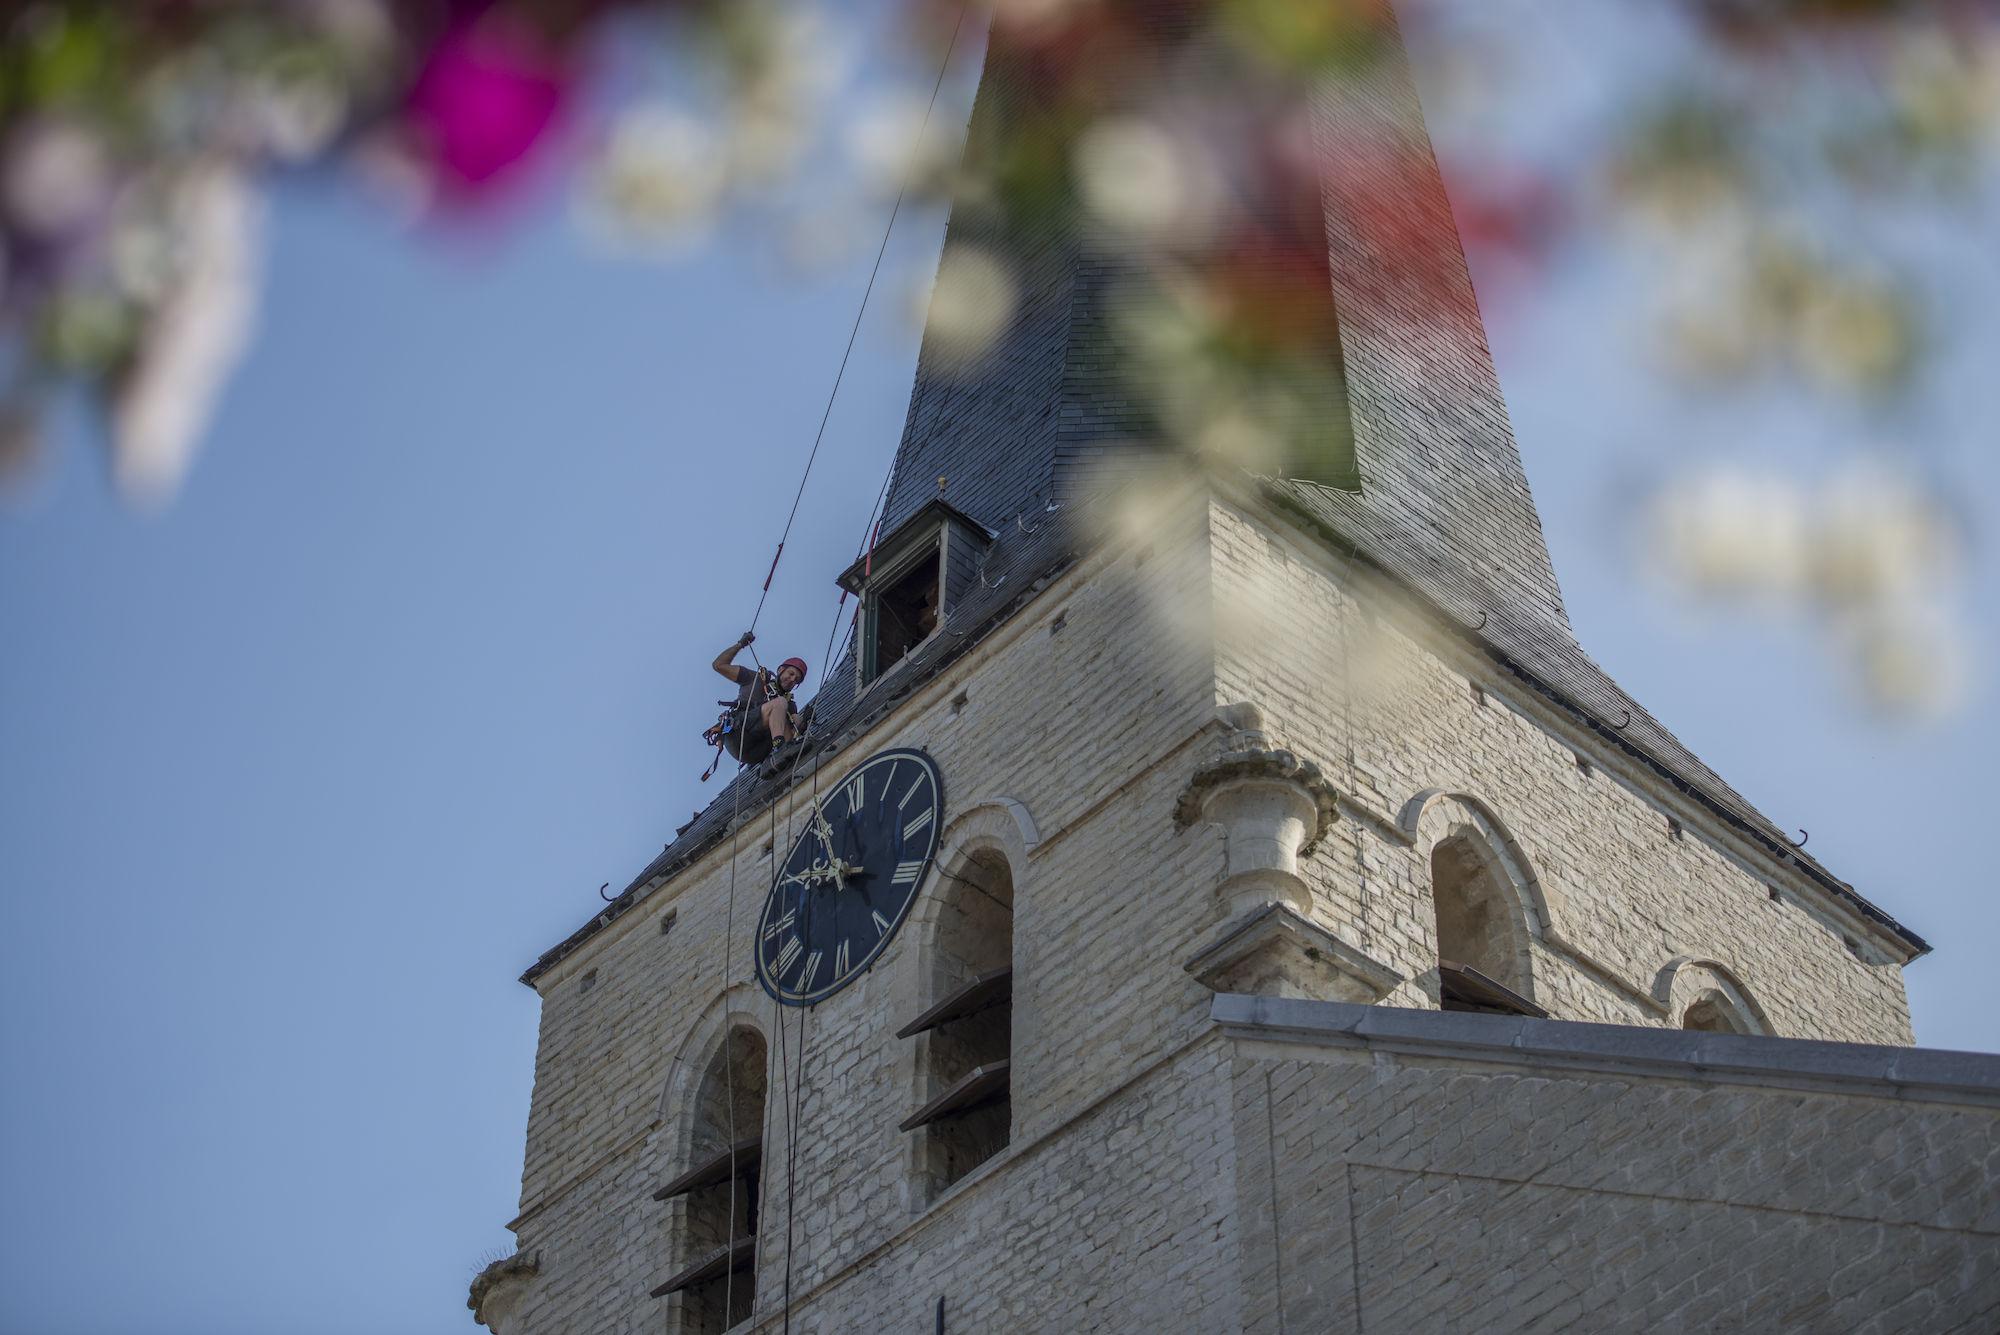 170823-Monumentenwacht-Kerk-Hamme-111.jpg